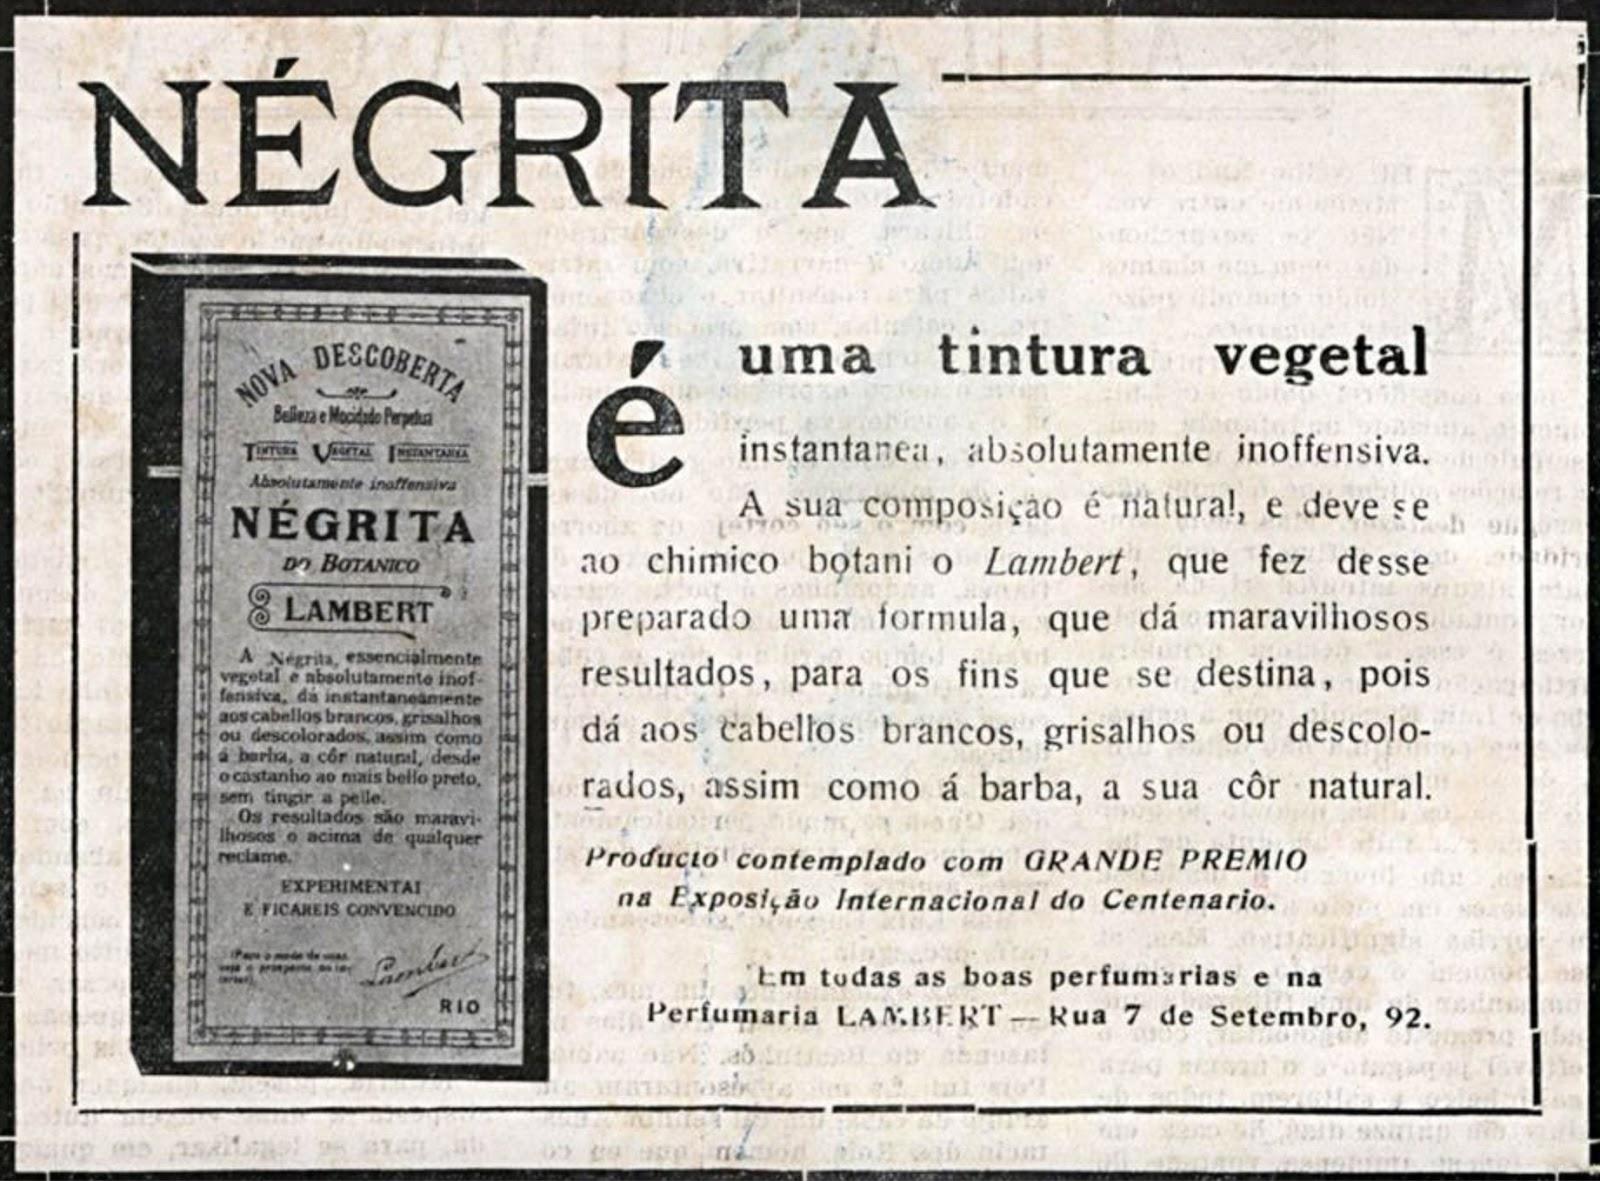 Propaganda de 1924 apresentando a Tintura Negrita para cabelos brancos e grisalhos